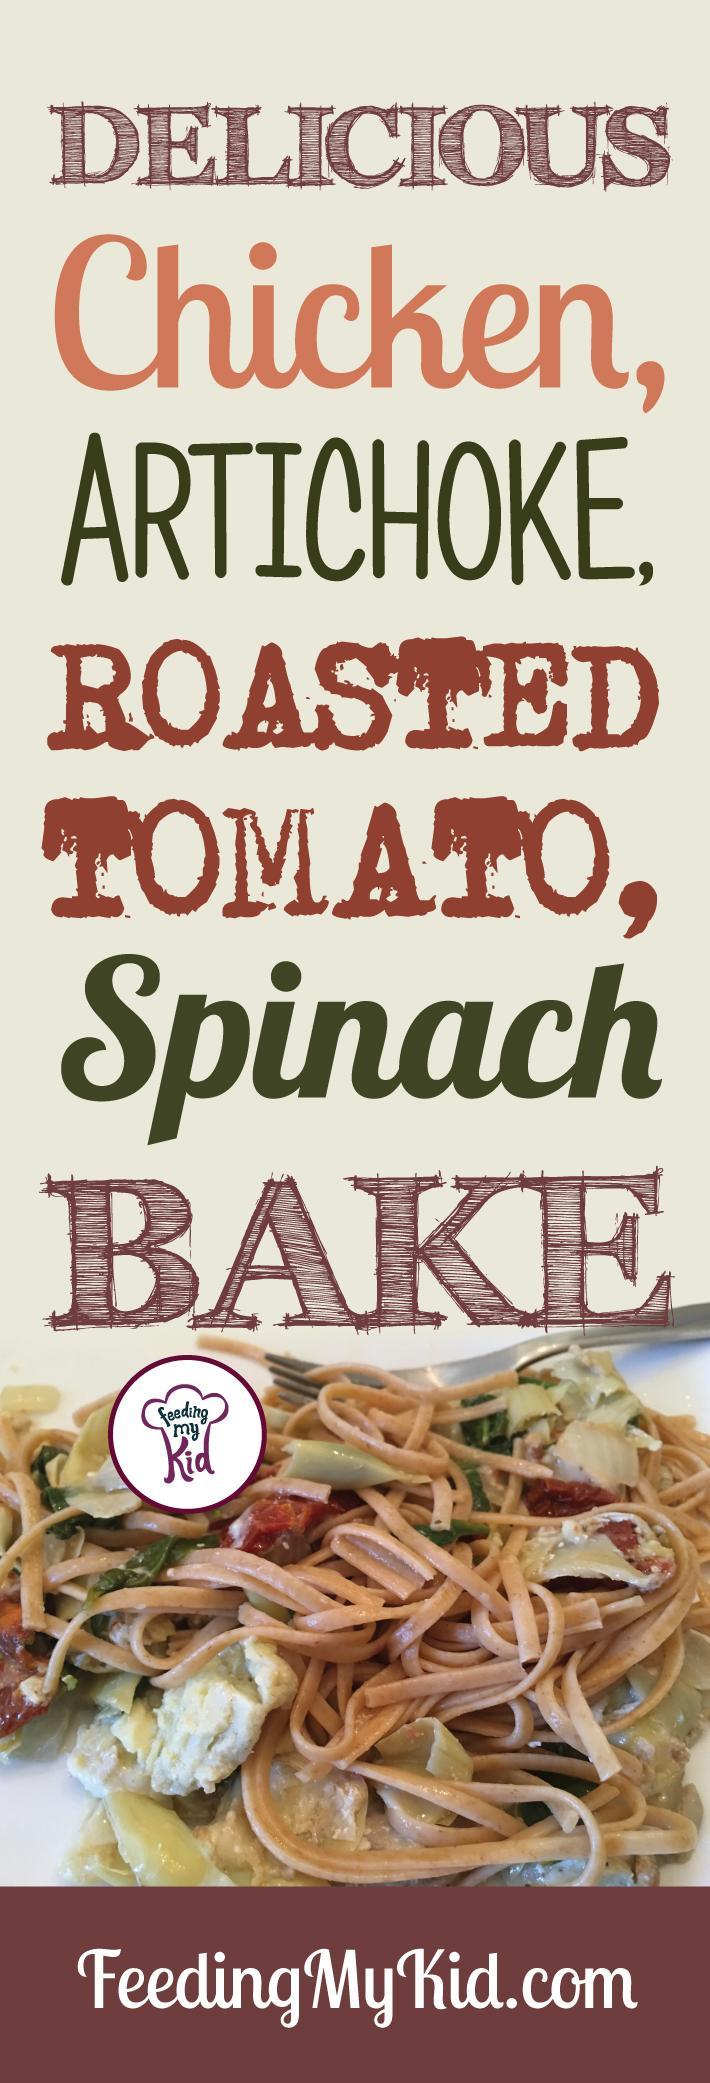 spinach-bake-736px-x-2748